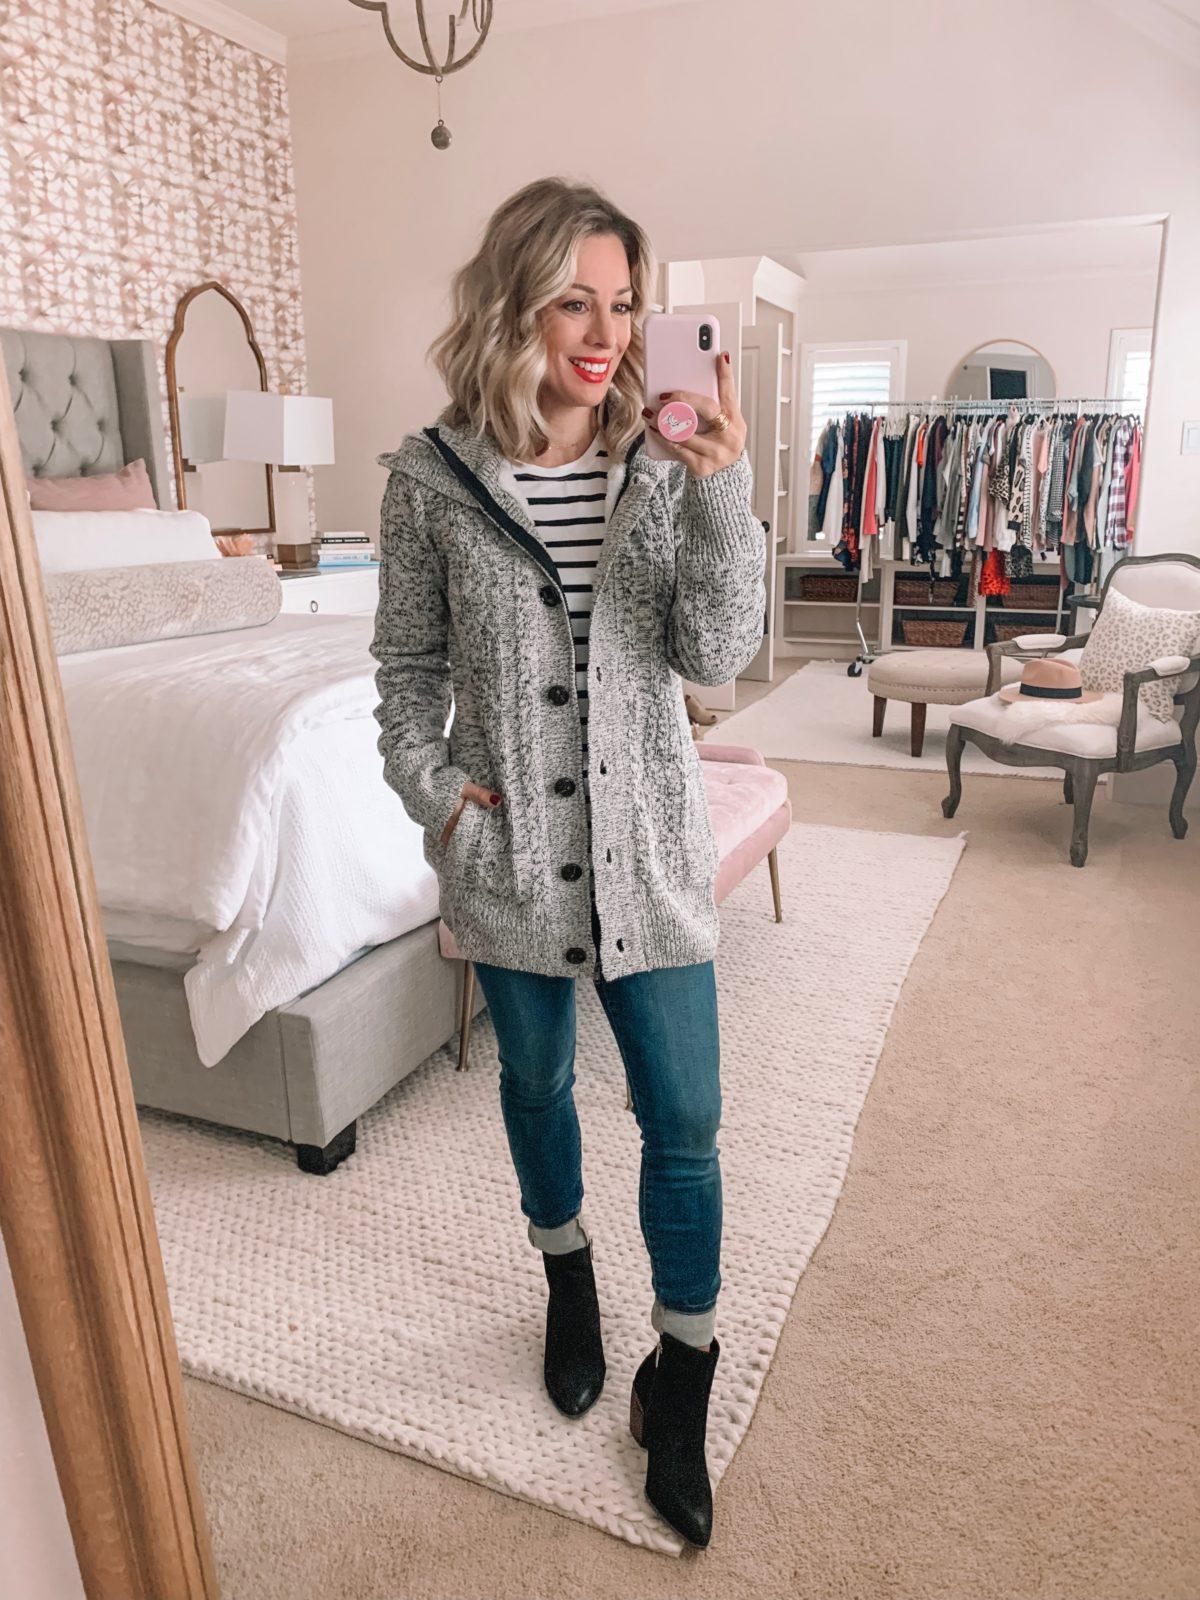 Amazon Prime Fashion- Striped Top and Coat